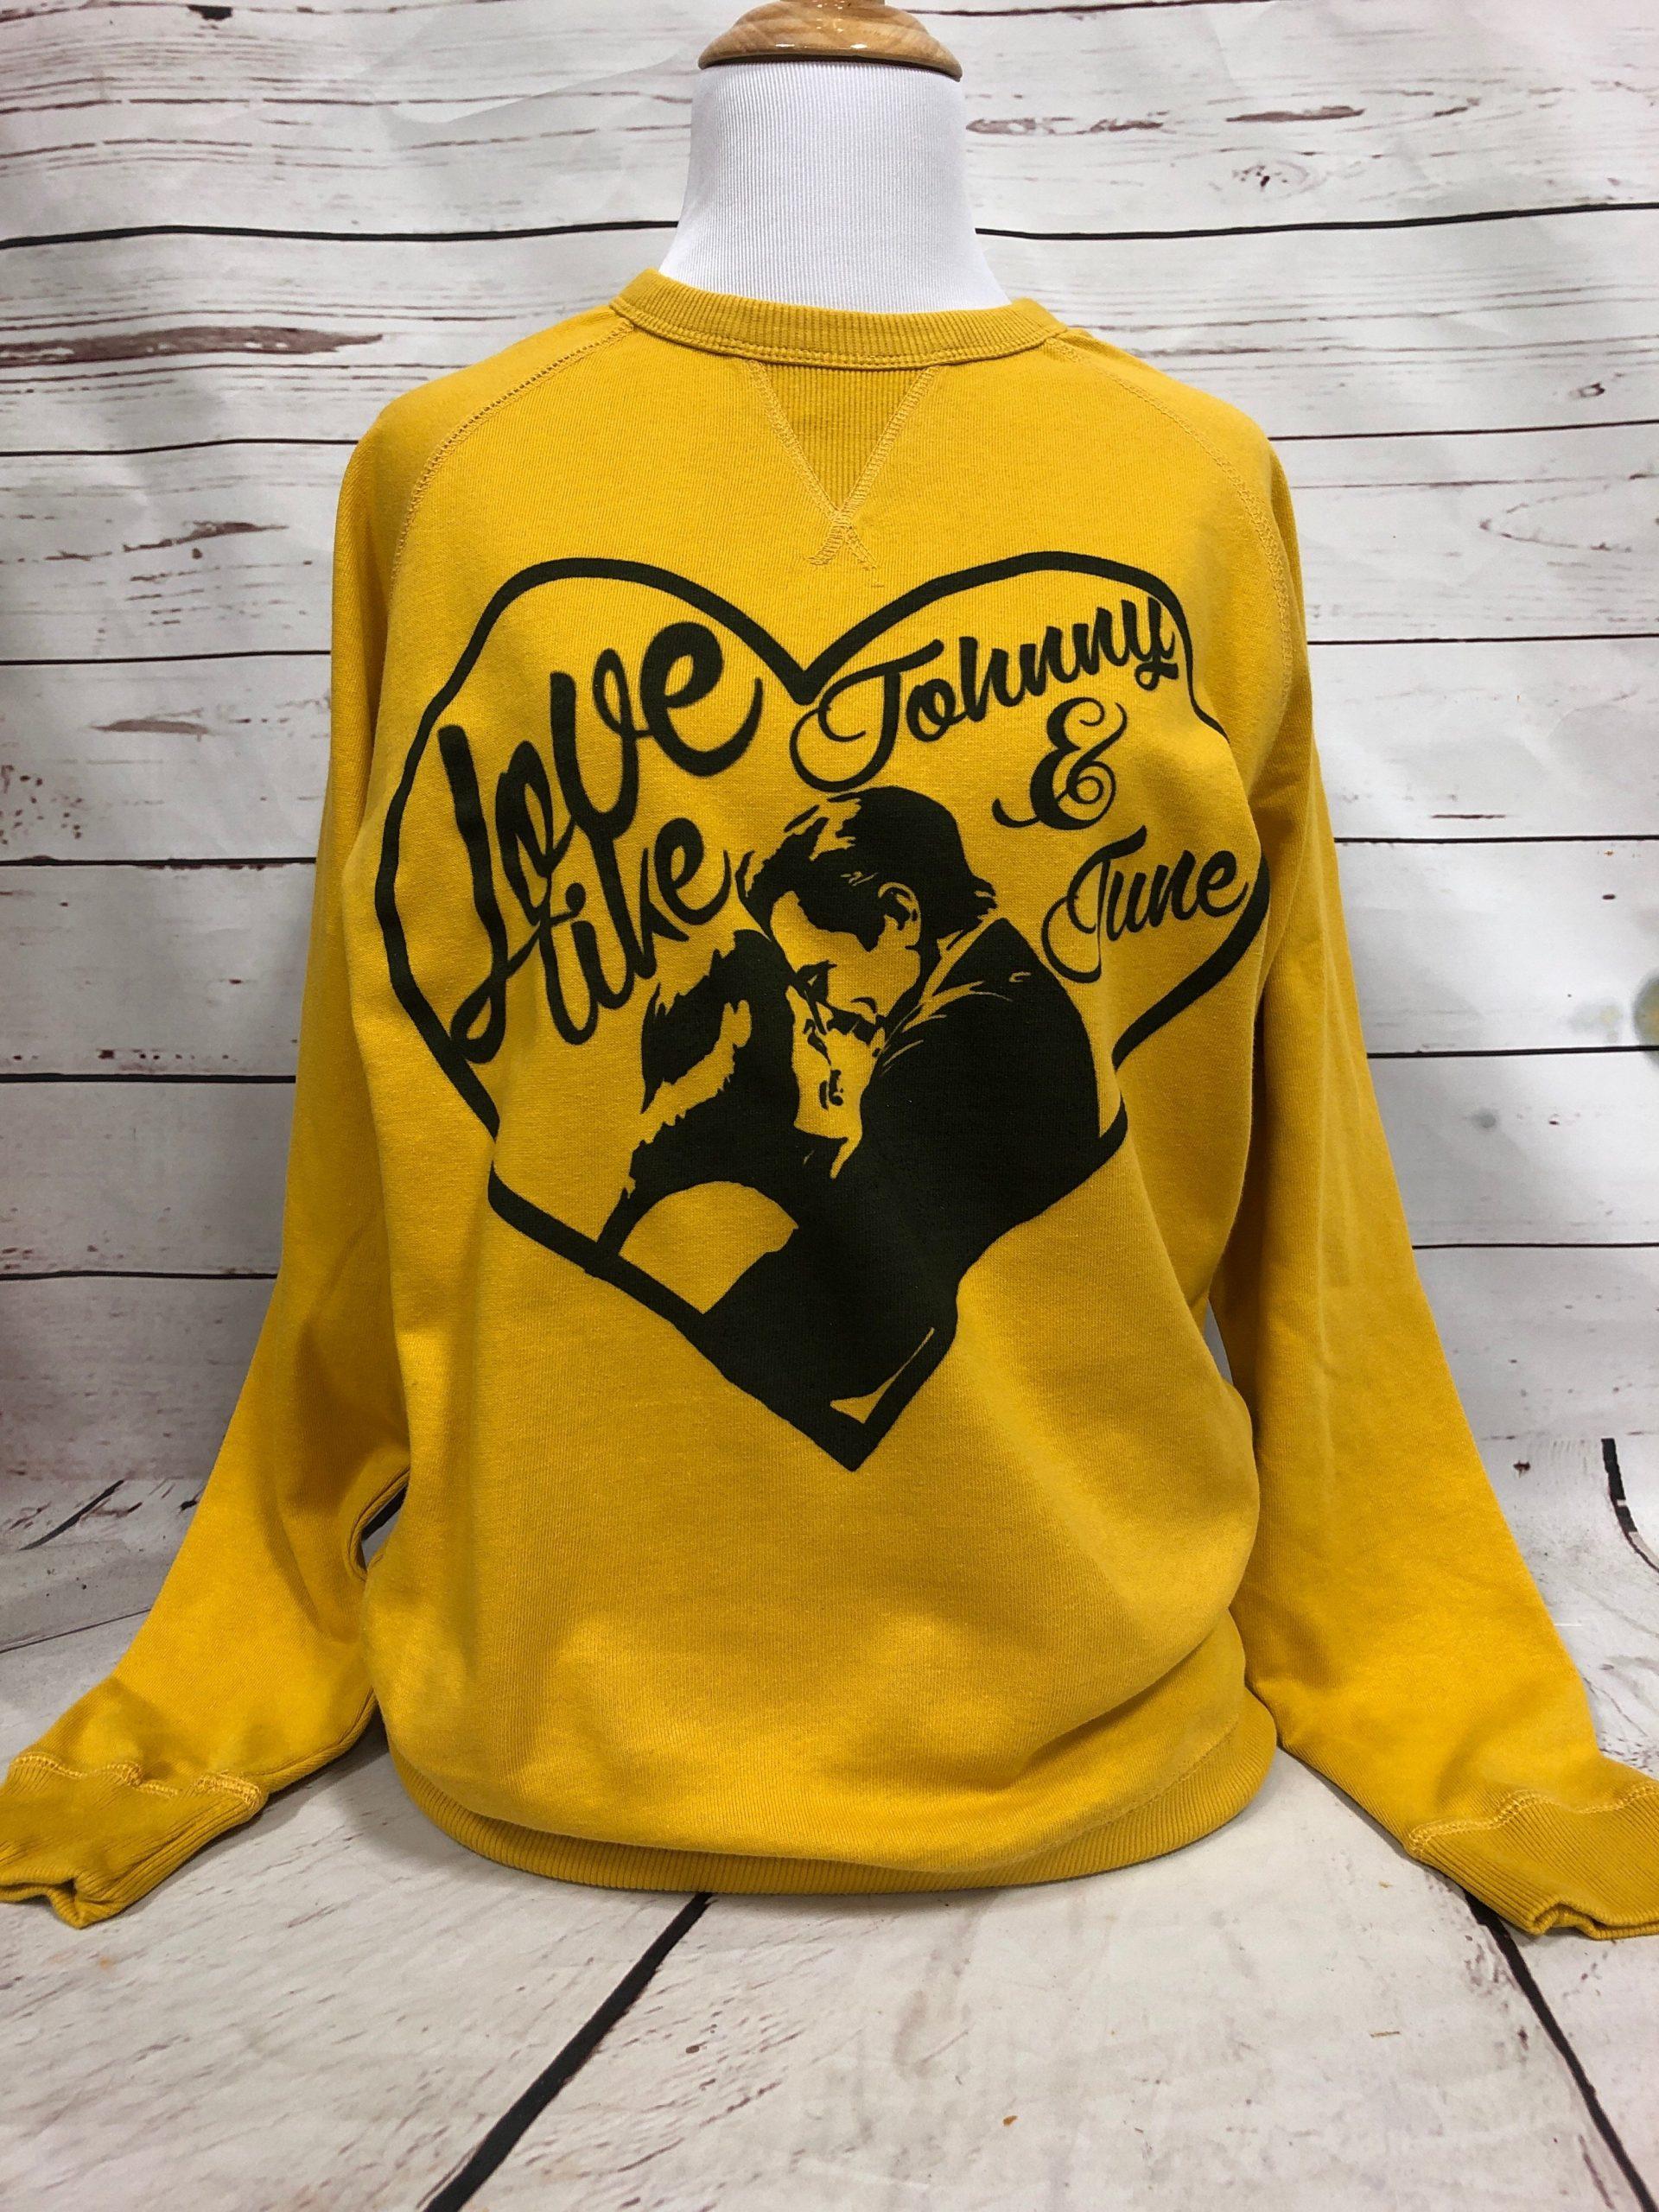 Love like Johnny & June on Mustard Sweatshirt